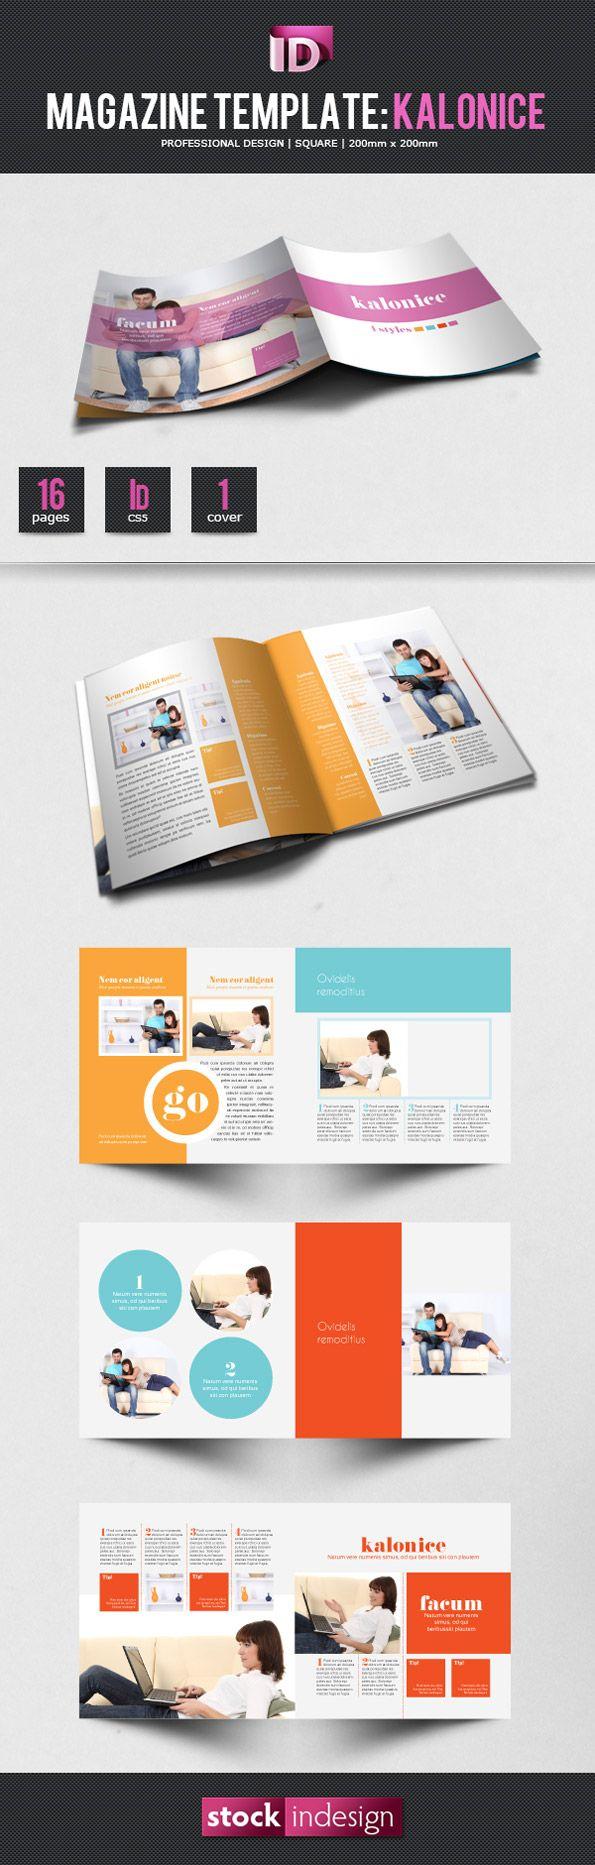 free indesign magazine template kalonice spread em pinterest